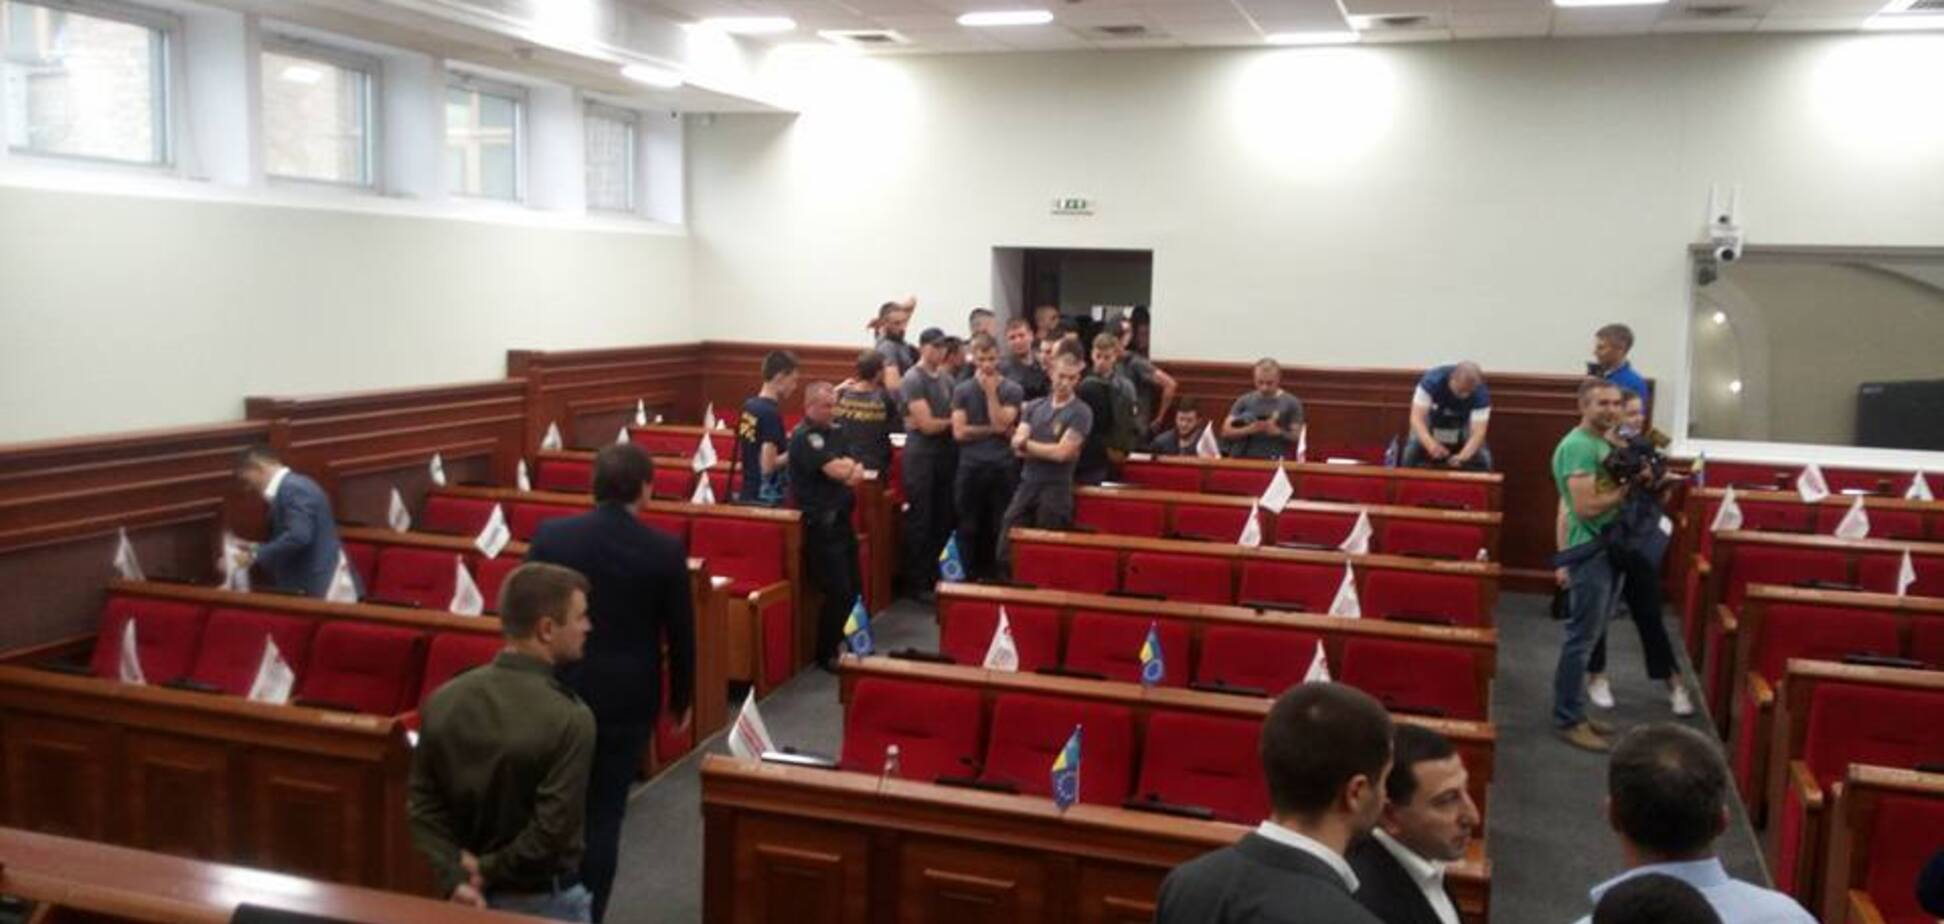 'Захоплення' Київради: радикали висунули умову